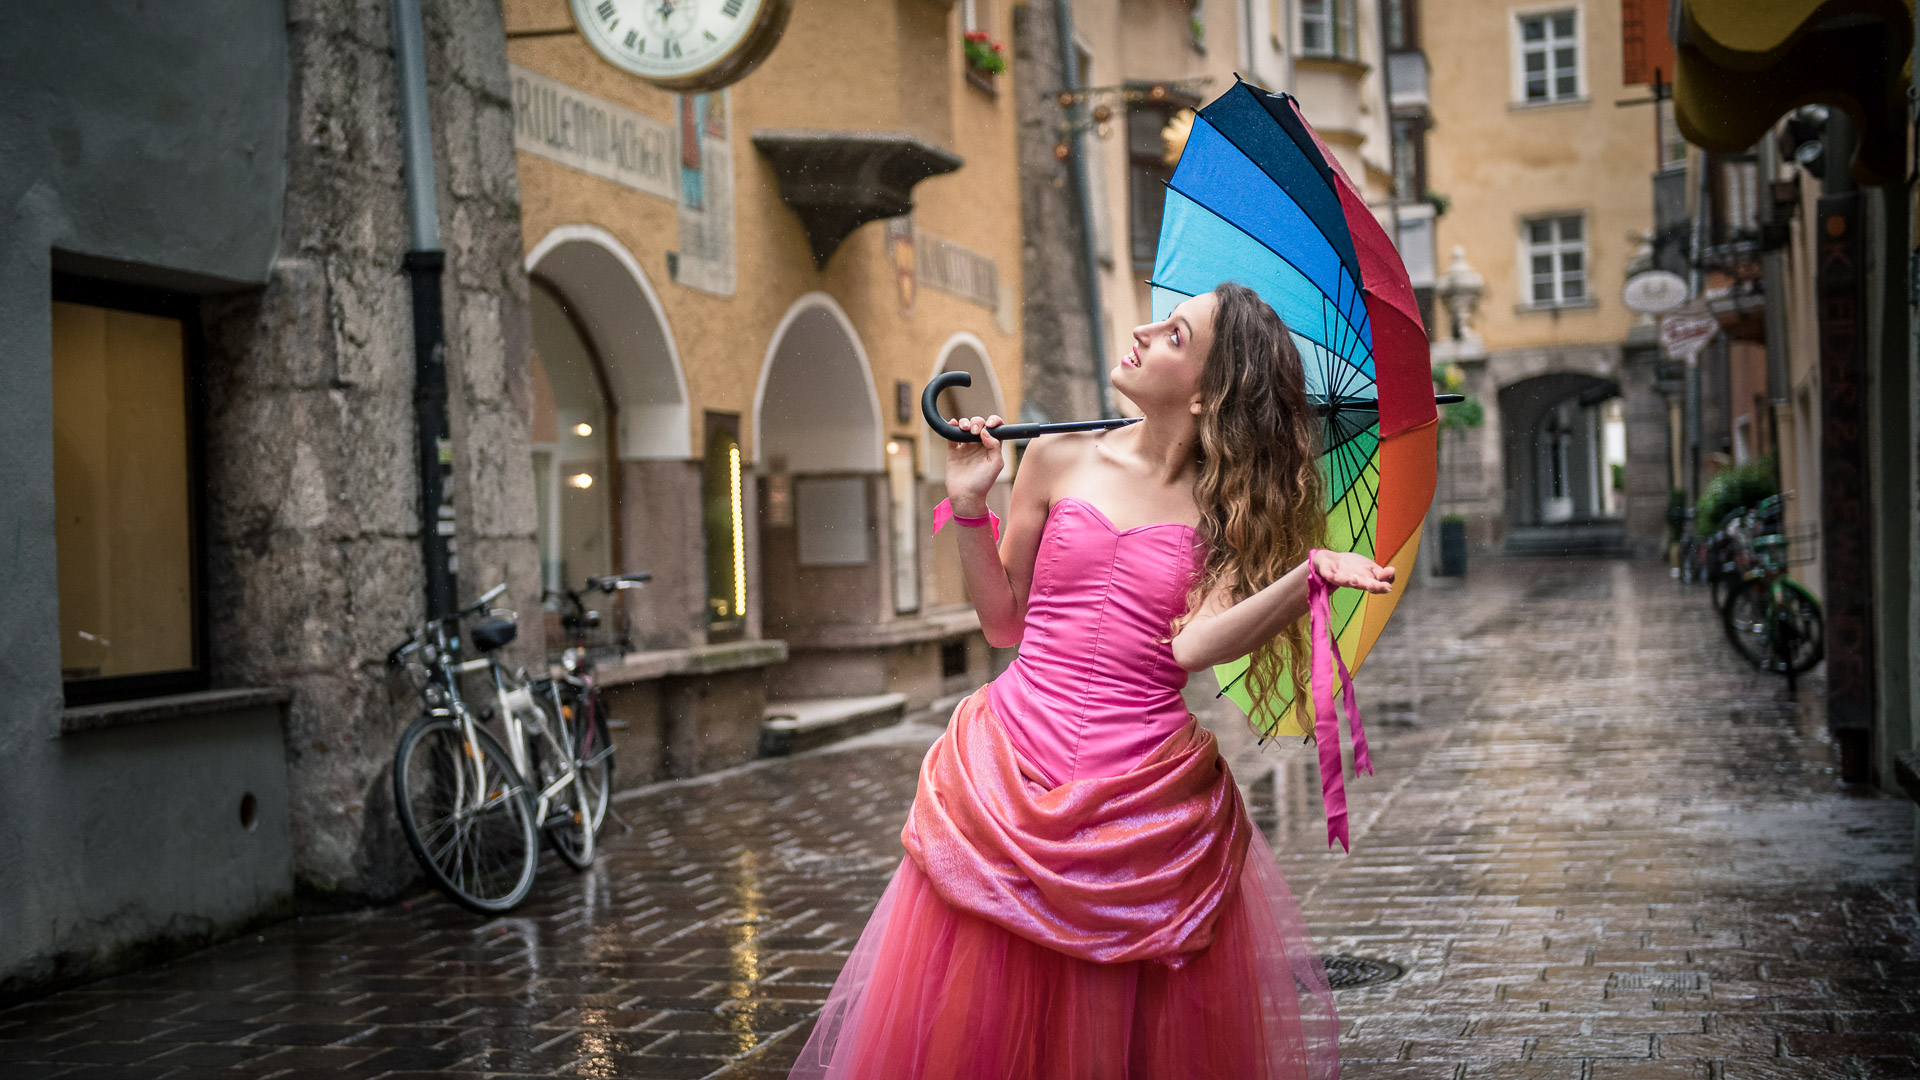 girl, pink dress, rain, umbrella, rainbow umbrella, old city, cobbled street, tulle skirt, corset